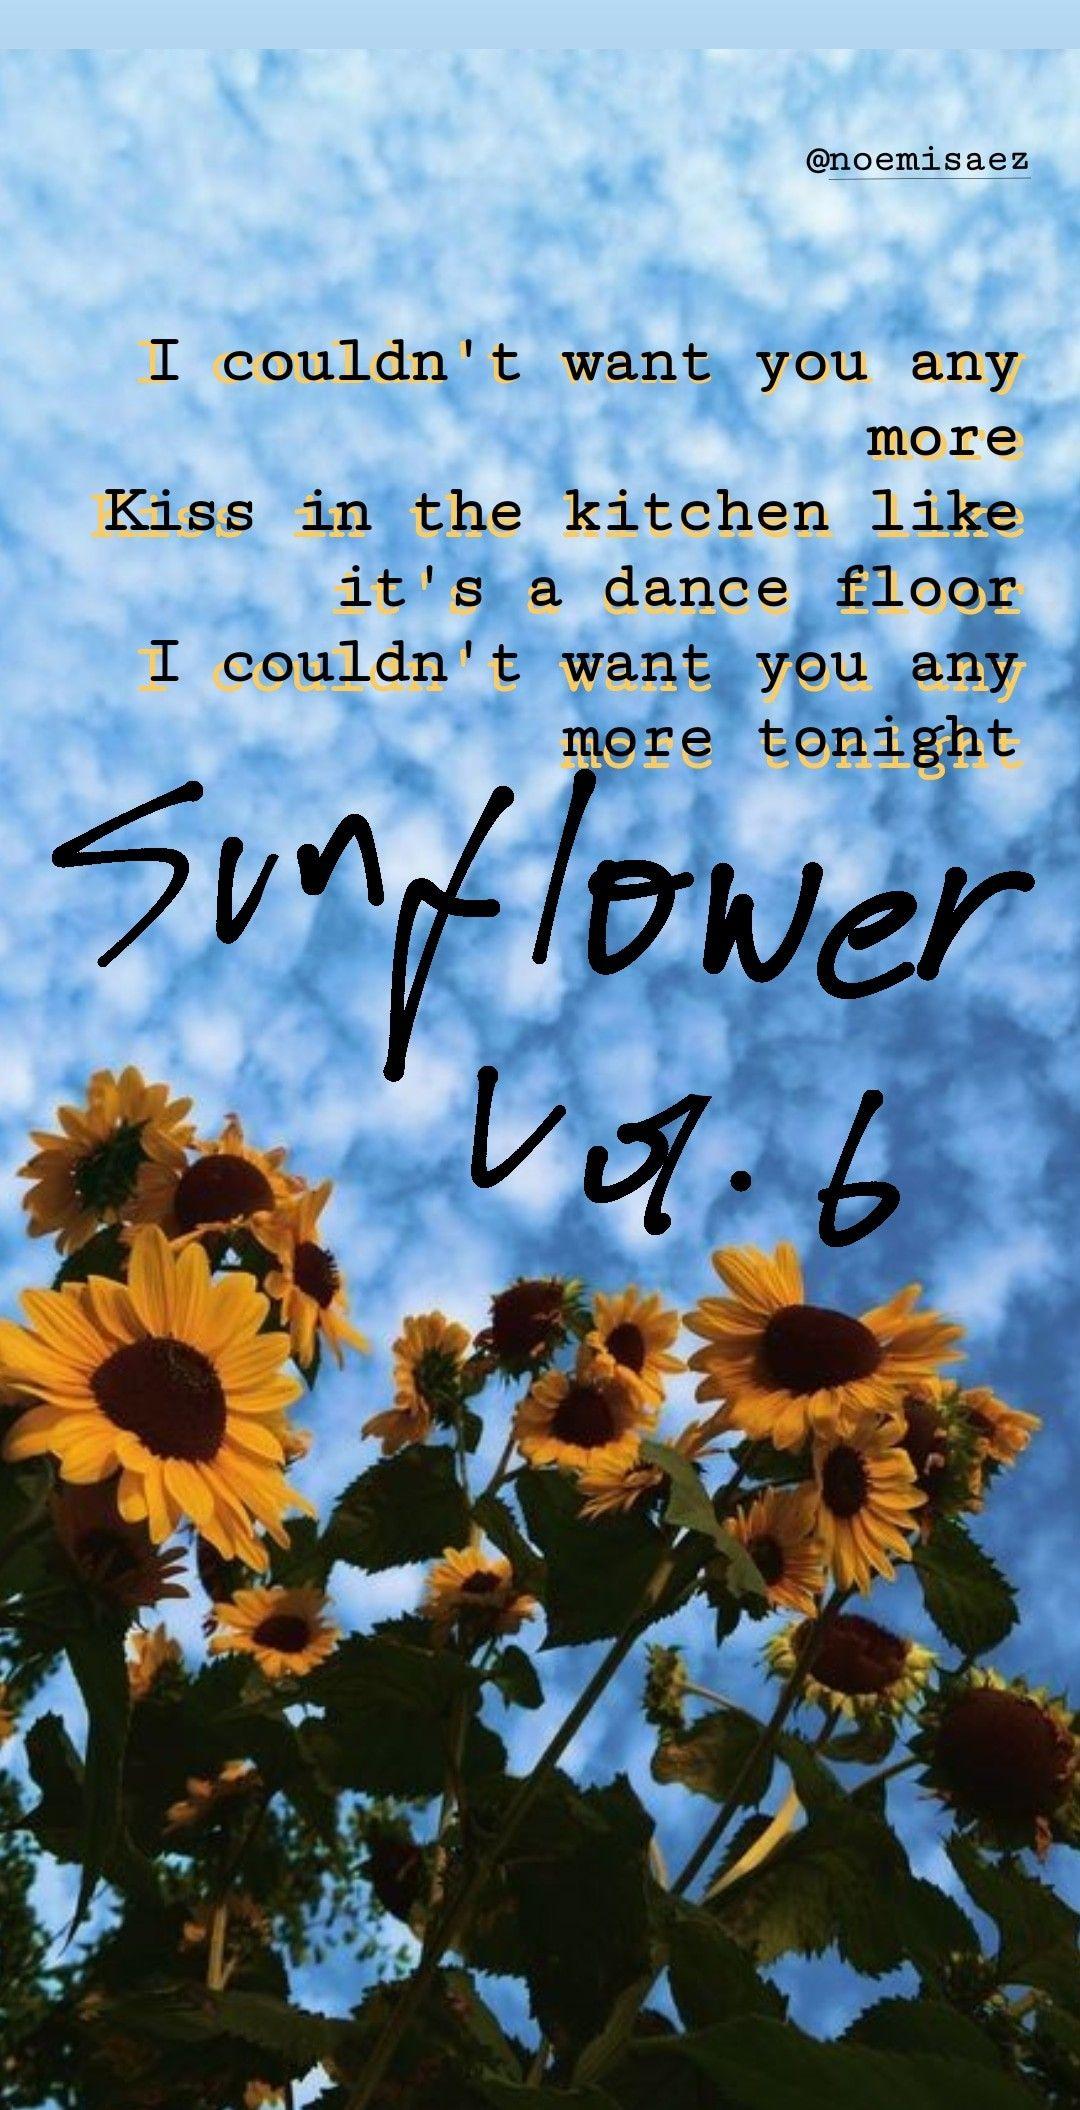 Sunflower, vol.6 , Harry styles Fondo de pantalla | Harry ...